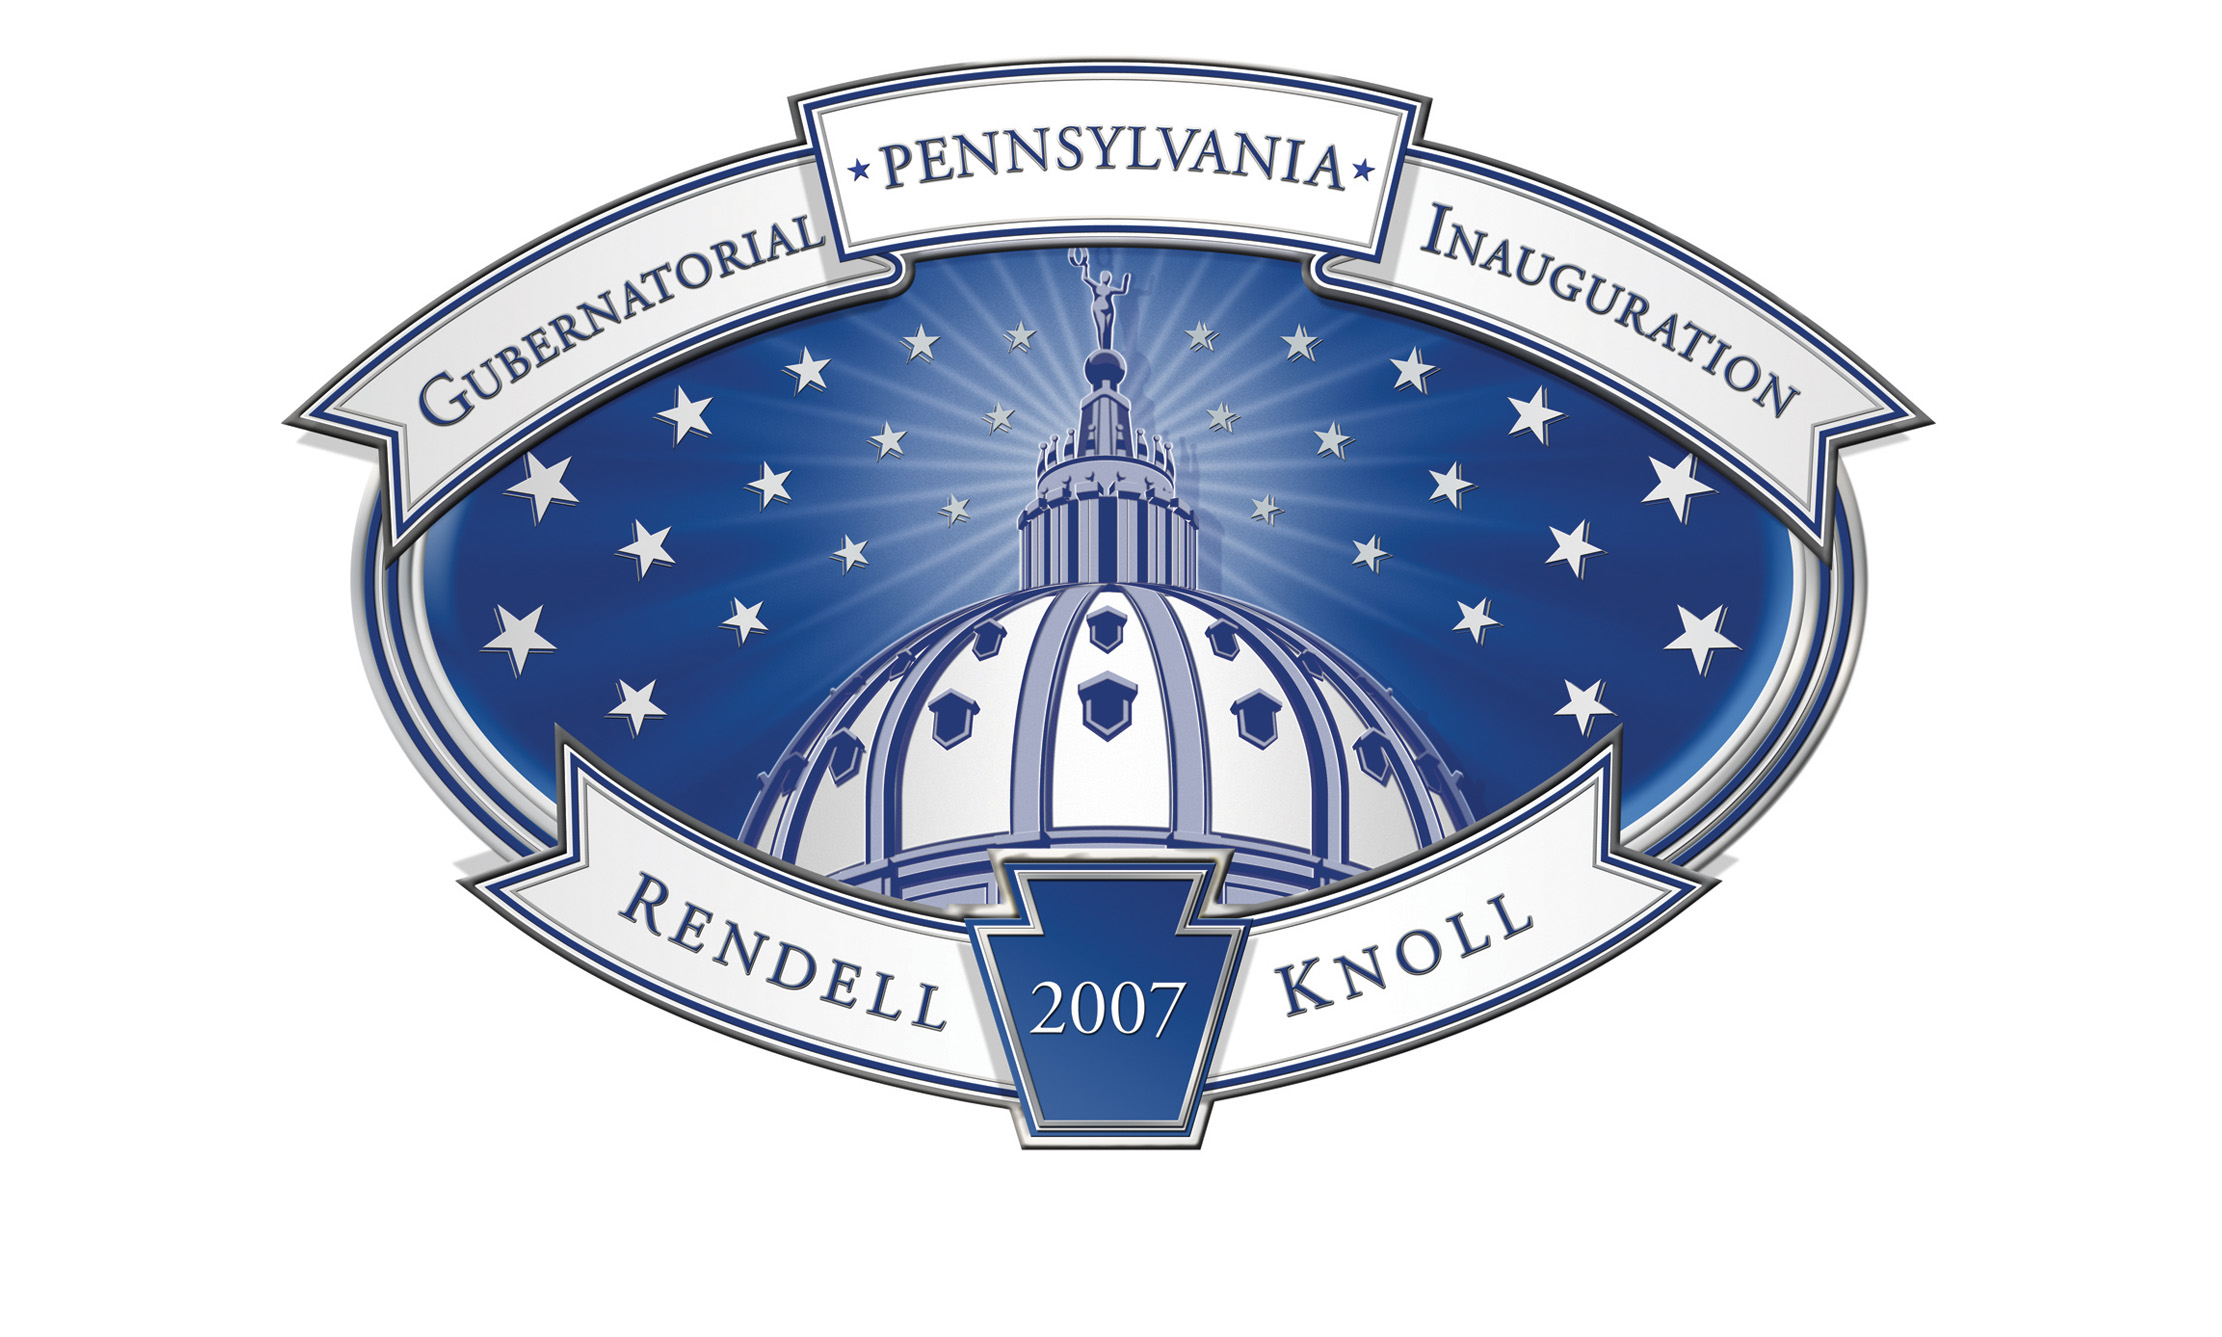 Pennsylvania Gubernatorial Inauguration logo